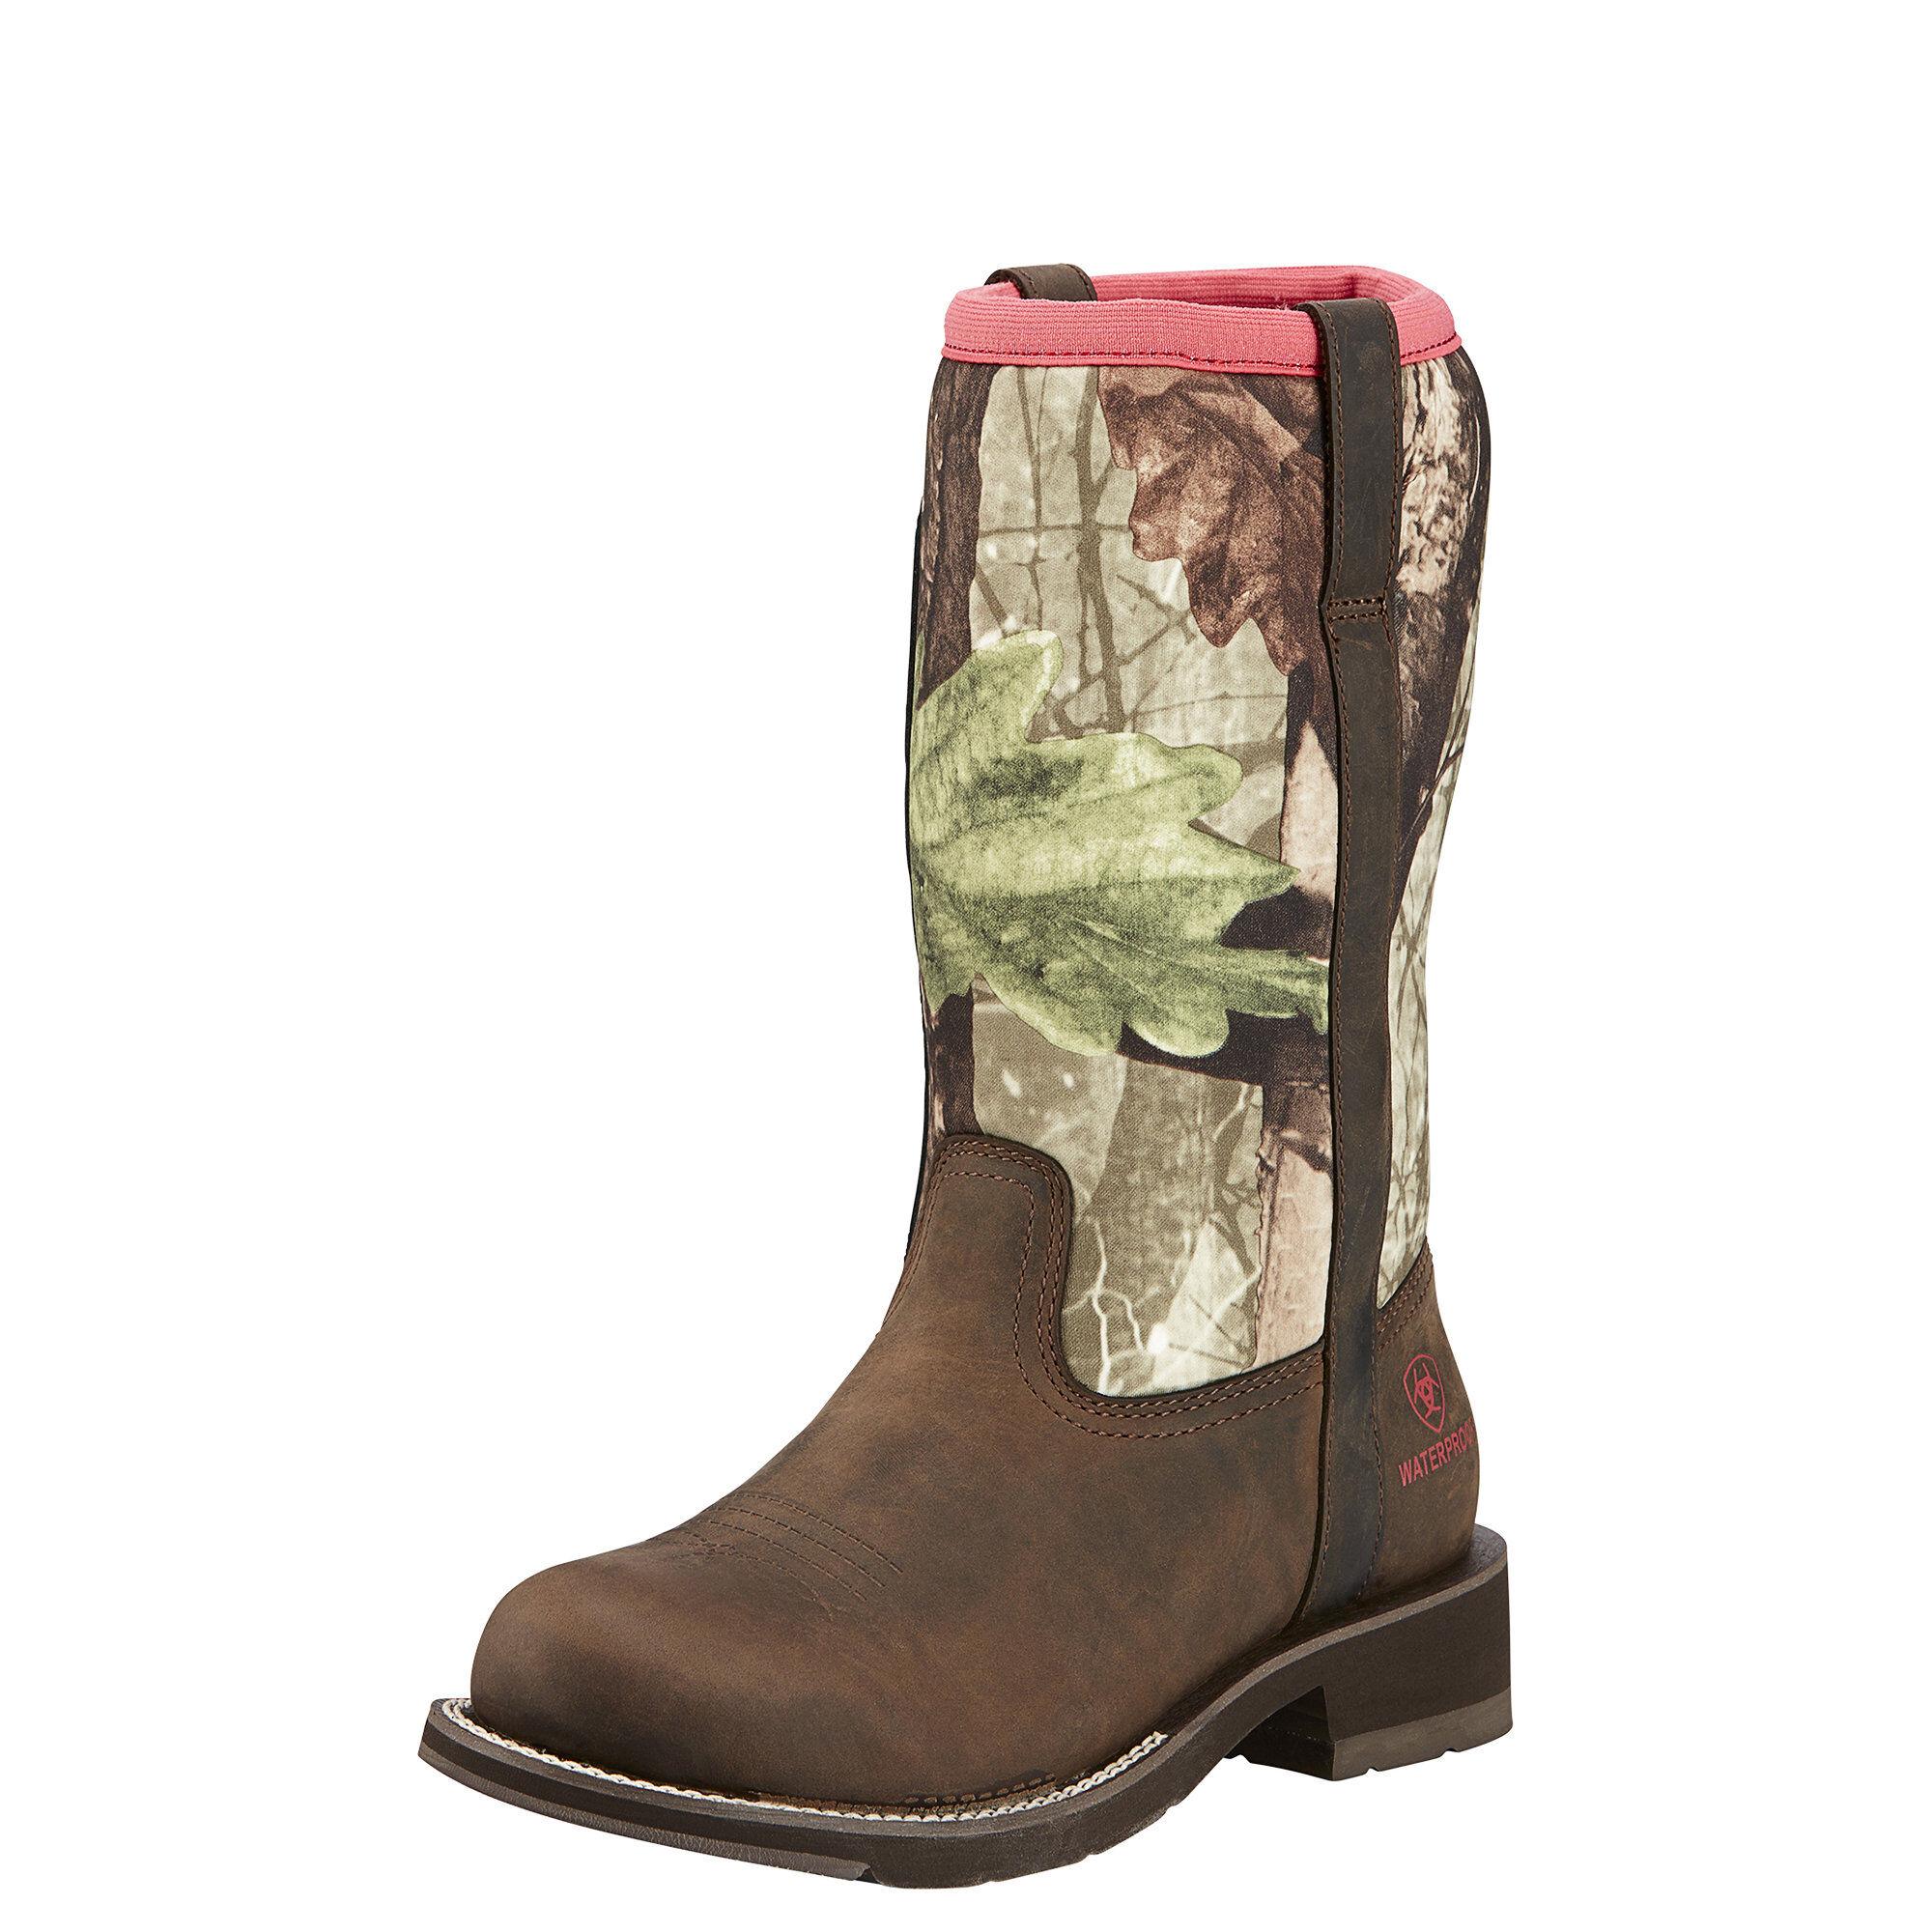 Fatbaby All Weather Waterproof Western Boot